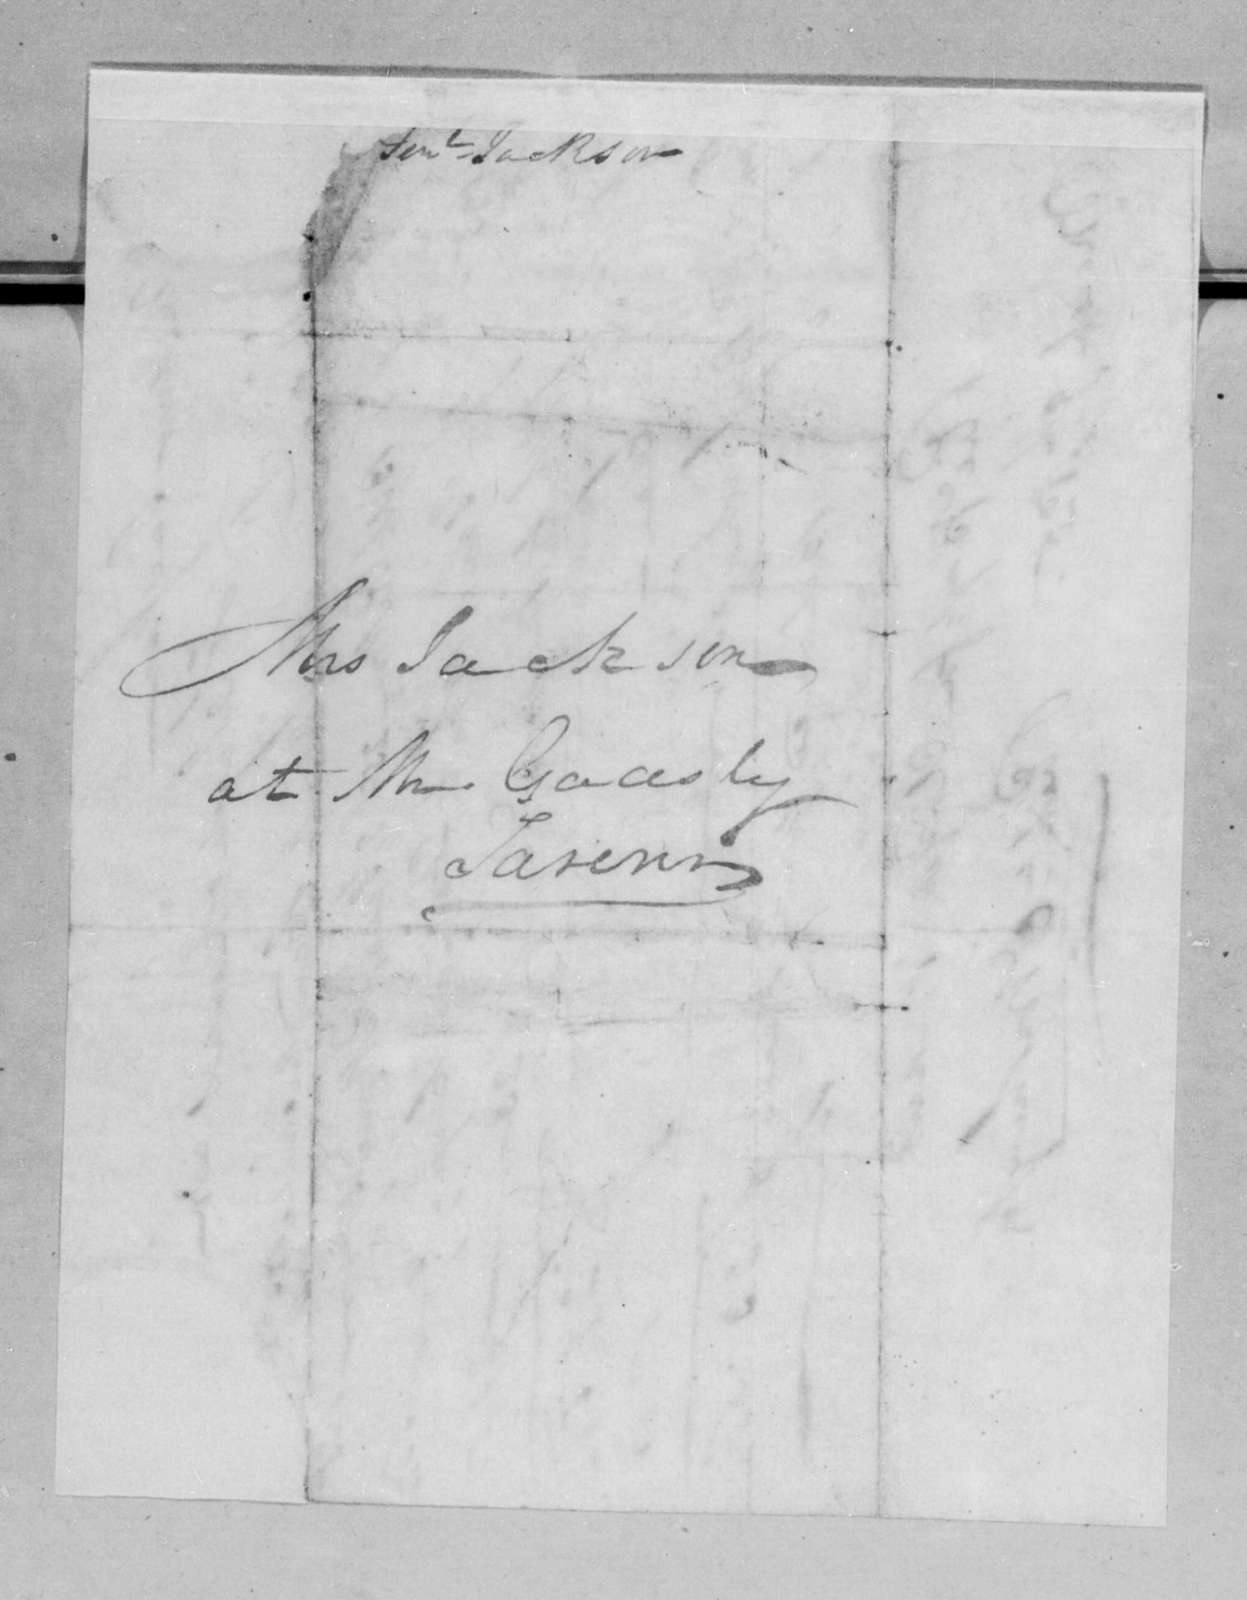 J. Washington to Andrew Jackson, March 9, 1825